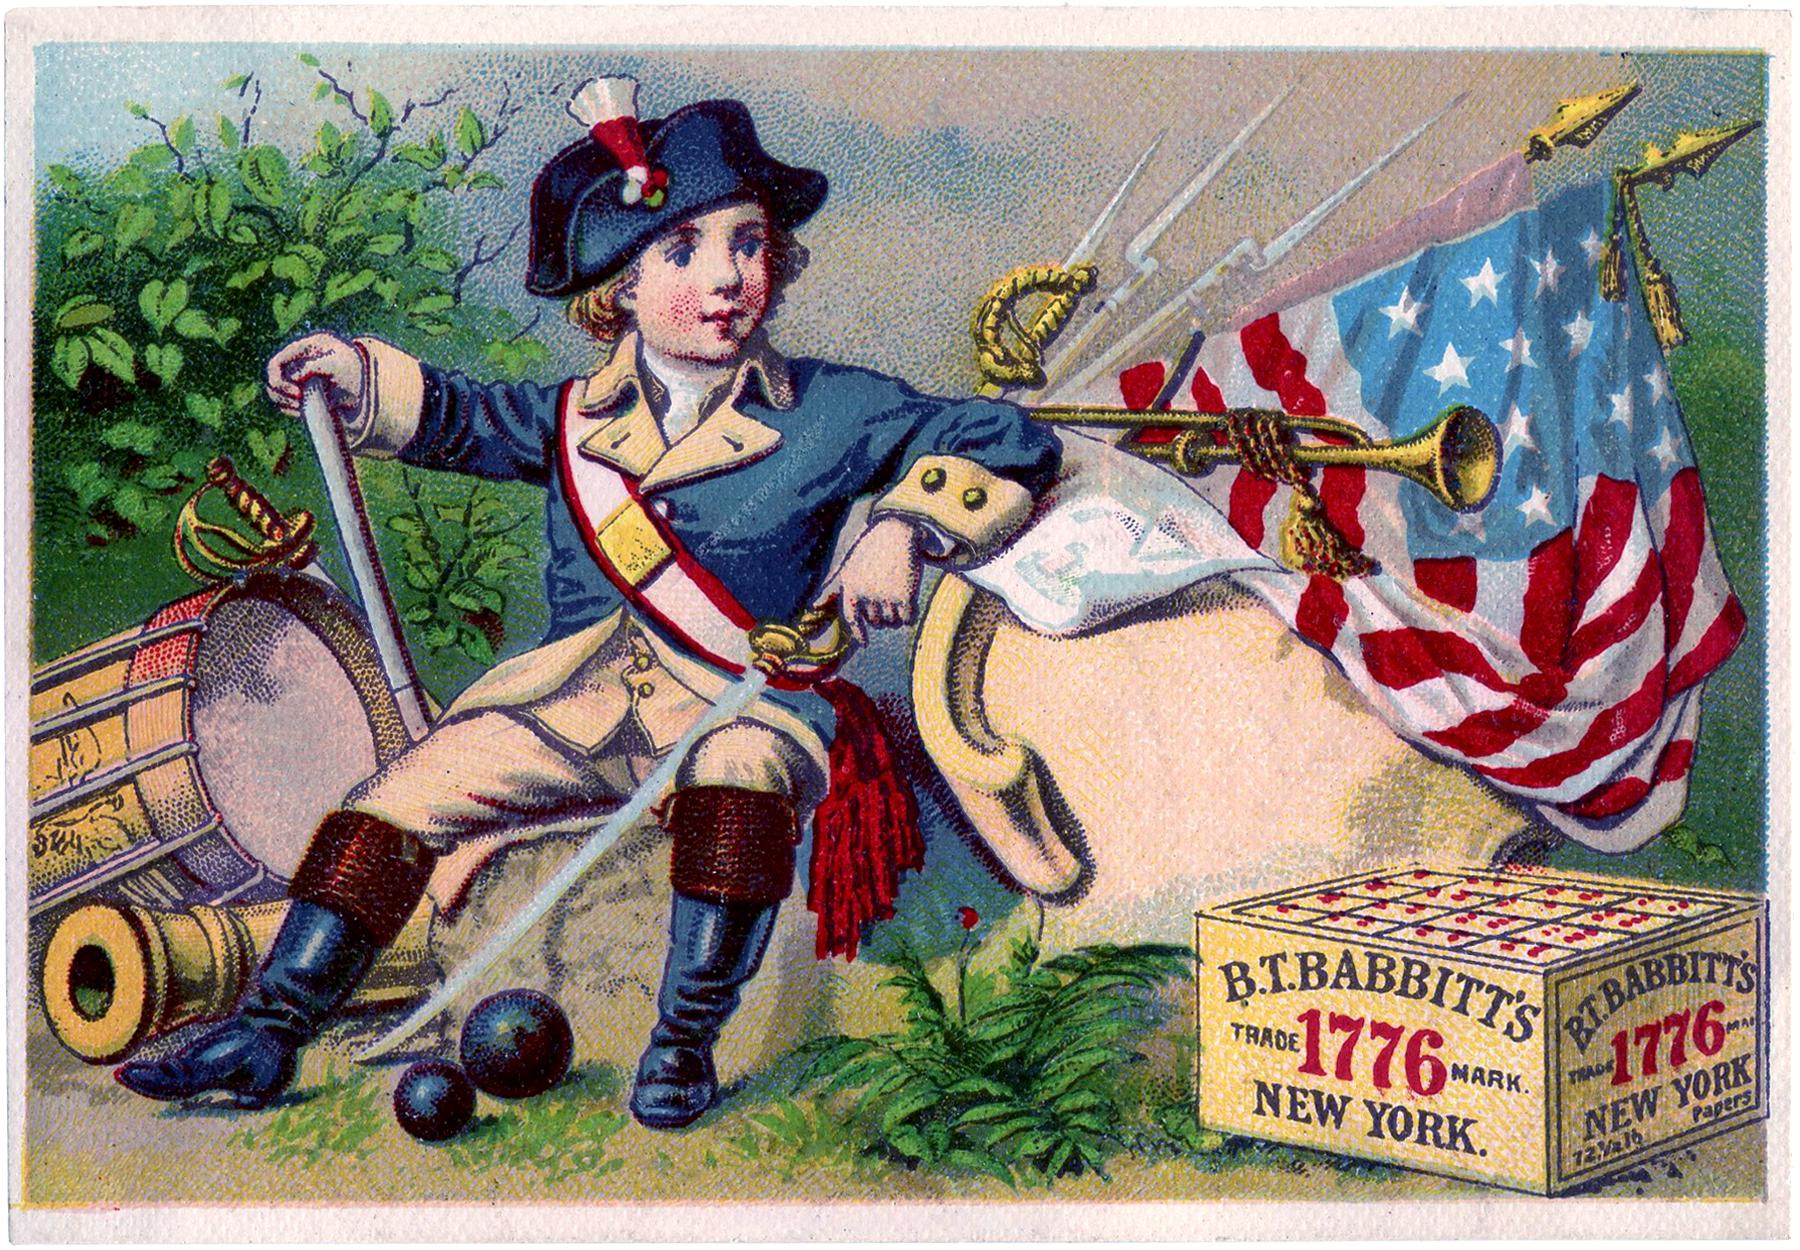 Cute Vintage Patriotic Download! - The Graphics Fairy Vintage Americana Graphics